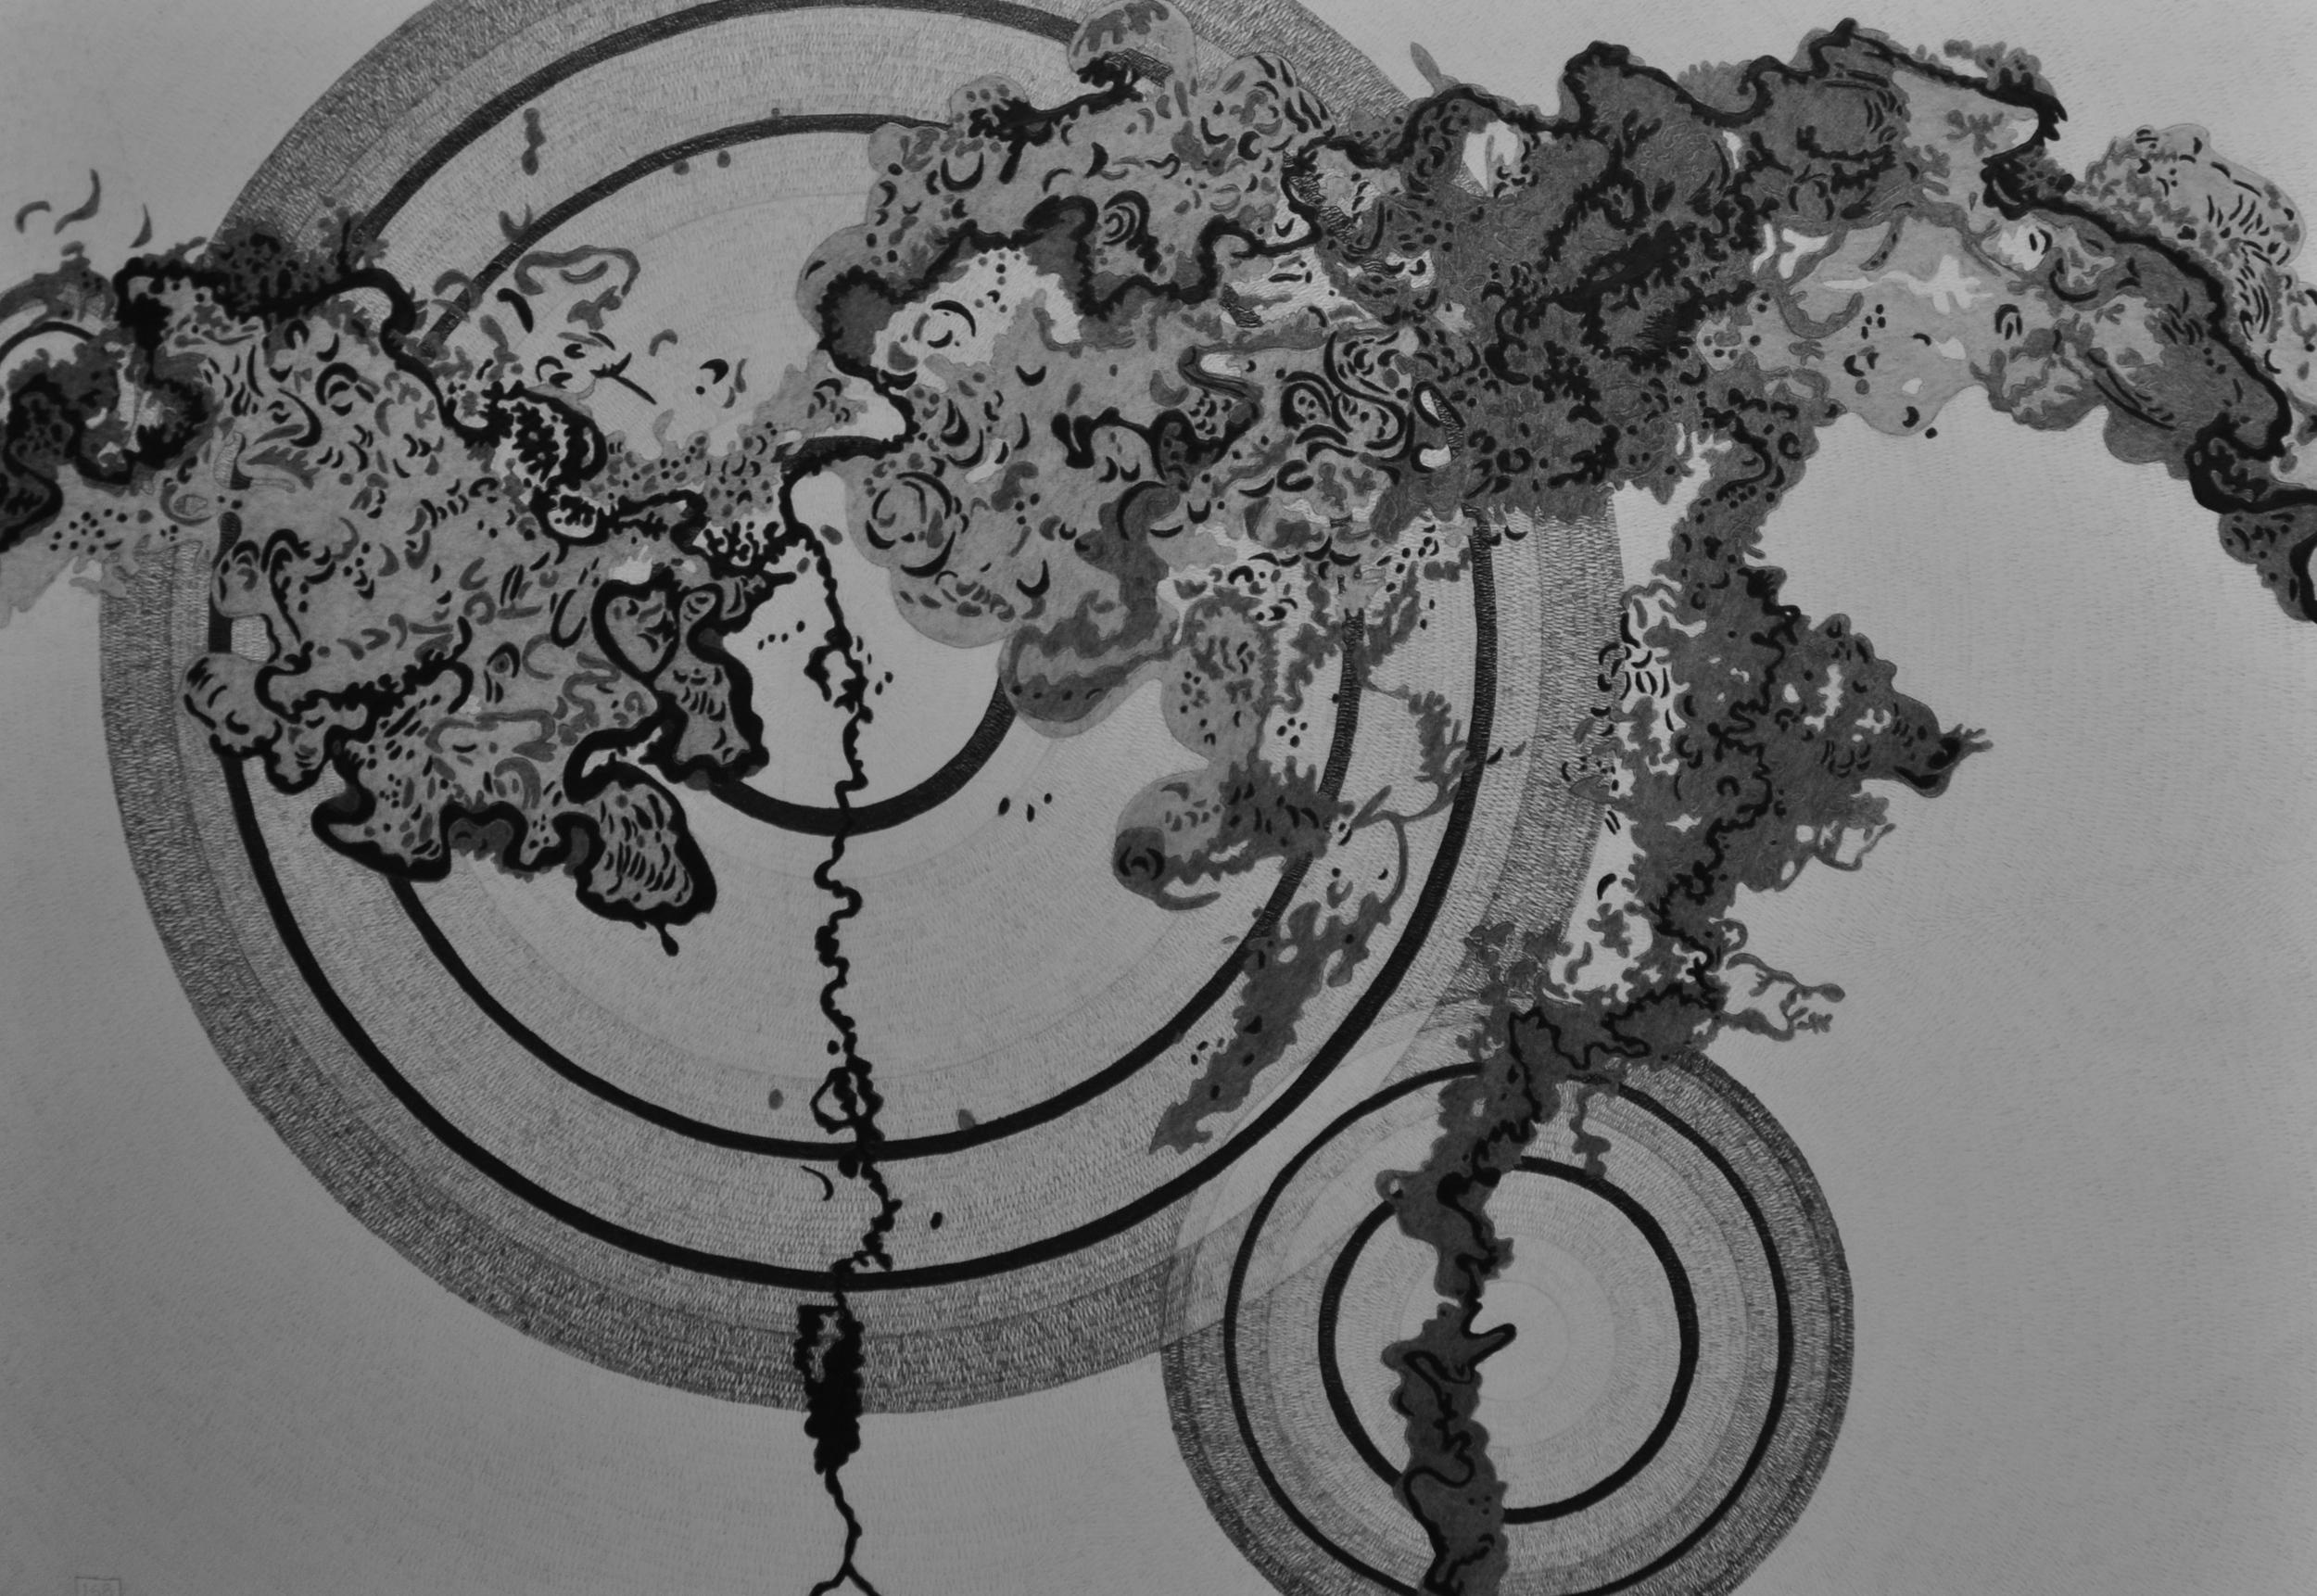 Weir, Christine,168, 2011, graphite on paper,14 x 20 inches.jpg